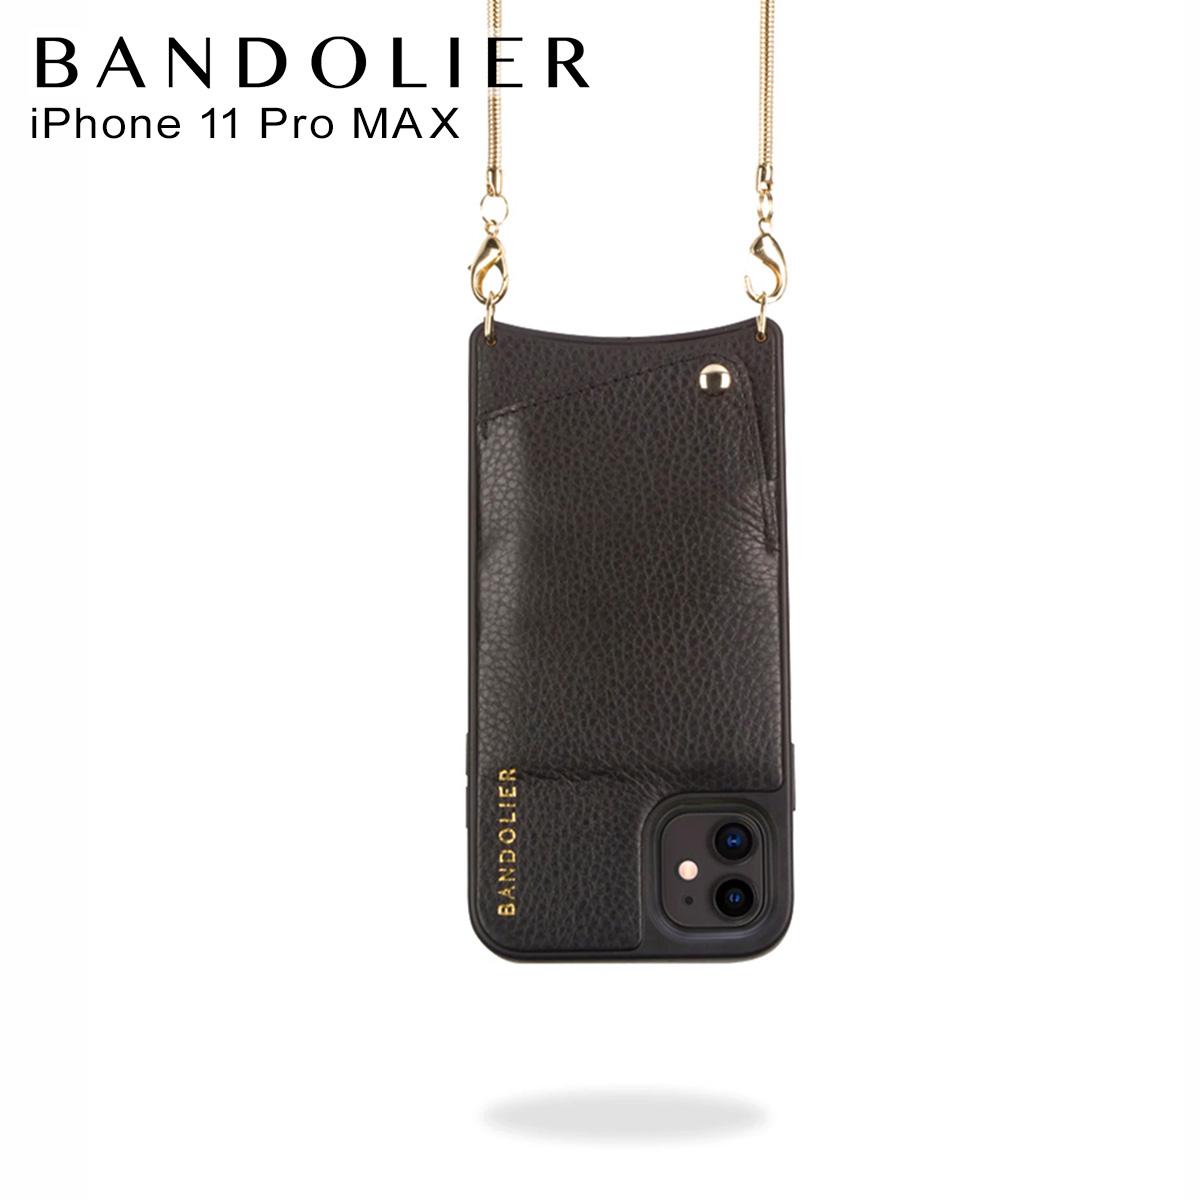 BANDOLIER バンドリヤー ベリンダ ゴールド iPhone11 Pro MAX ケース スマホ 携帯 ショルダー アイフォン メンズ レディース BELINDA GOLD ブラック 黒 2002